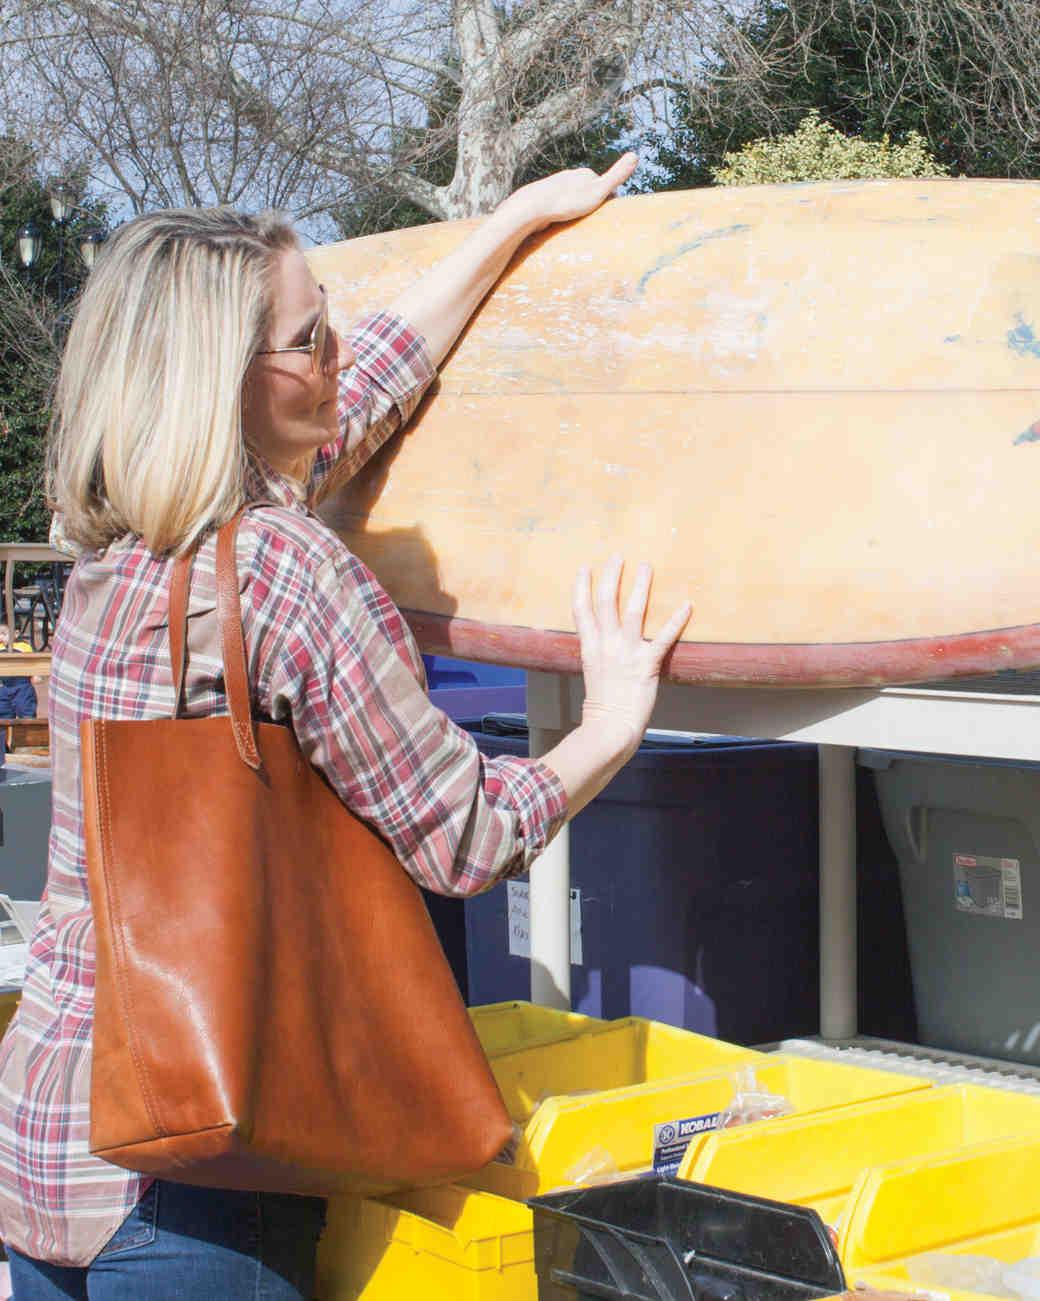 rustic-wedding-handbook-flea-market-tips-maggie-surfboard-0814.jpg